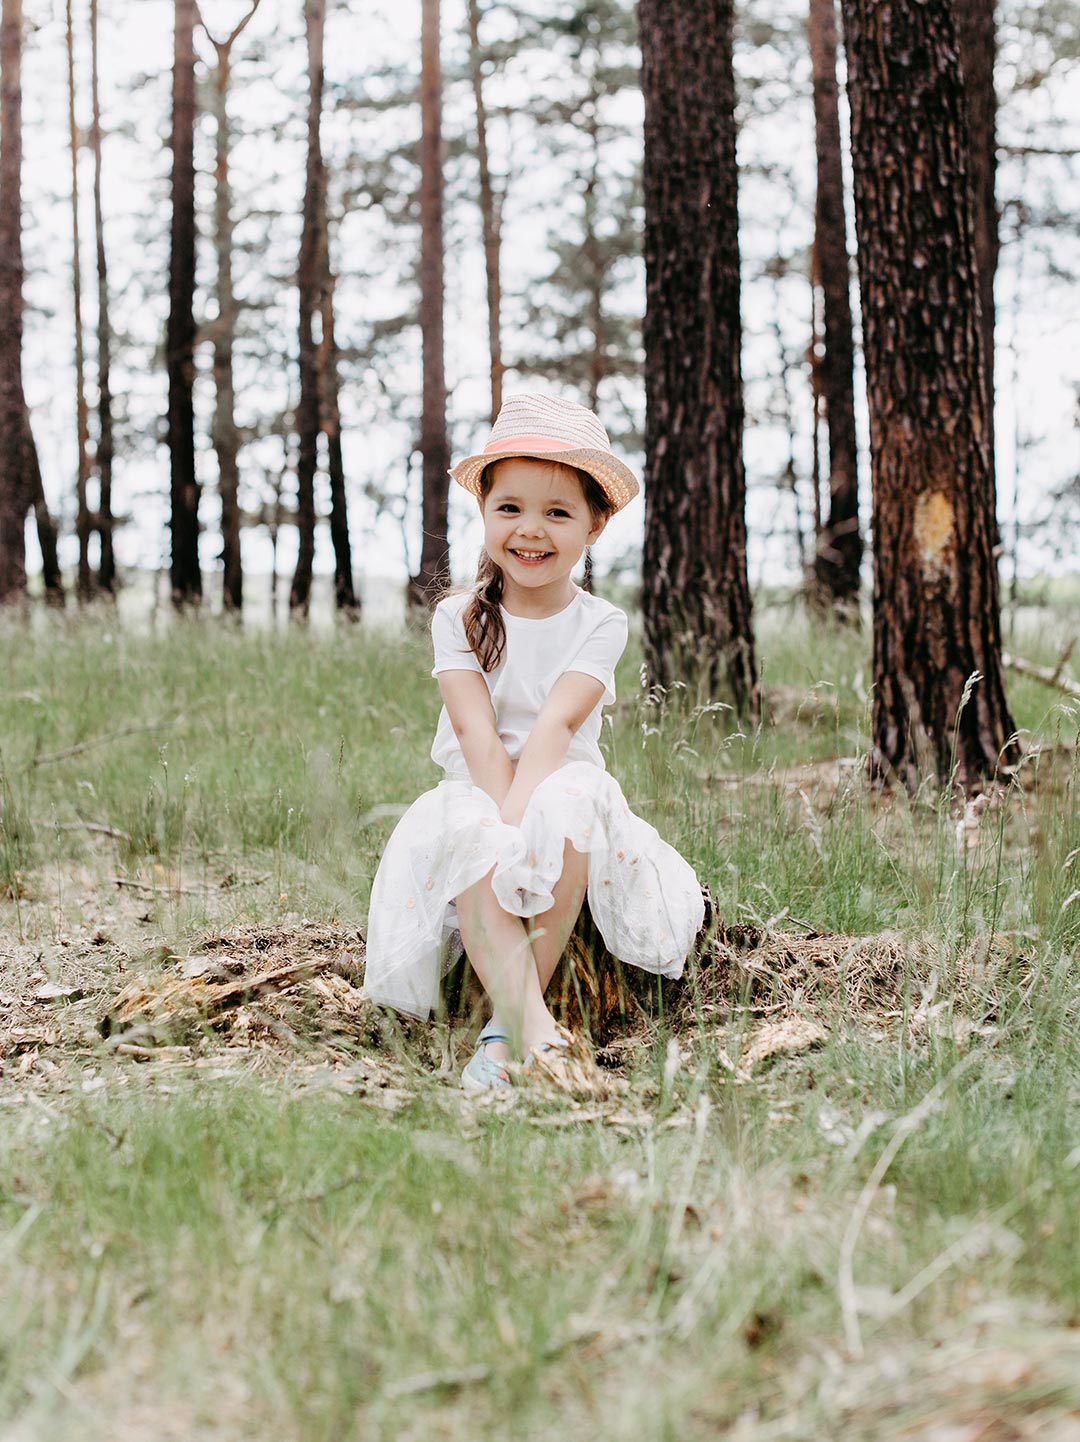 Fotografie Herzberg – Kids